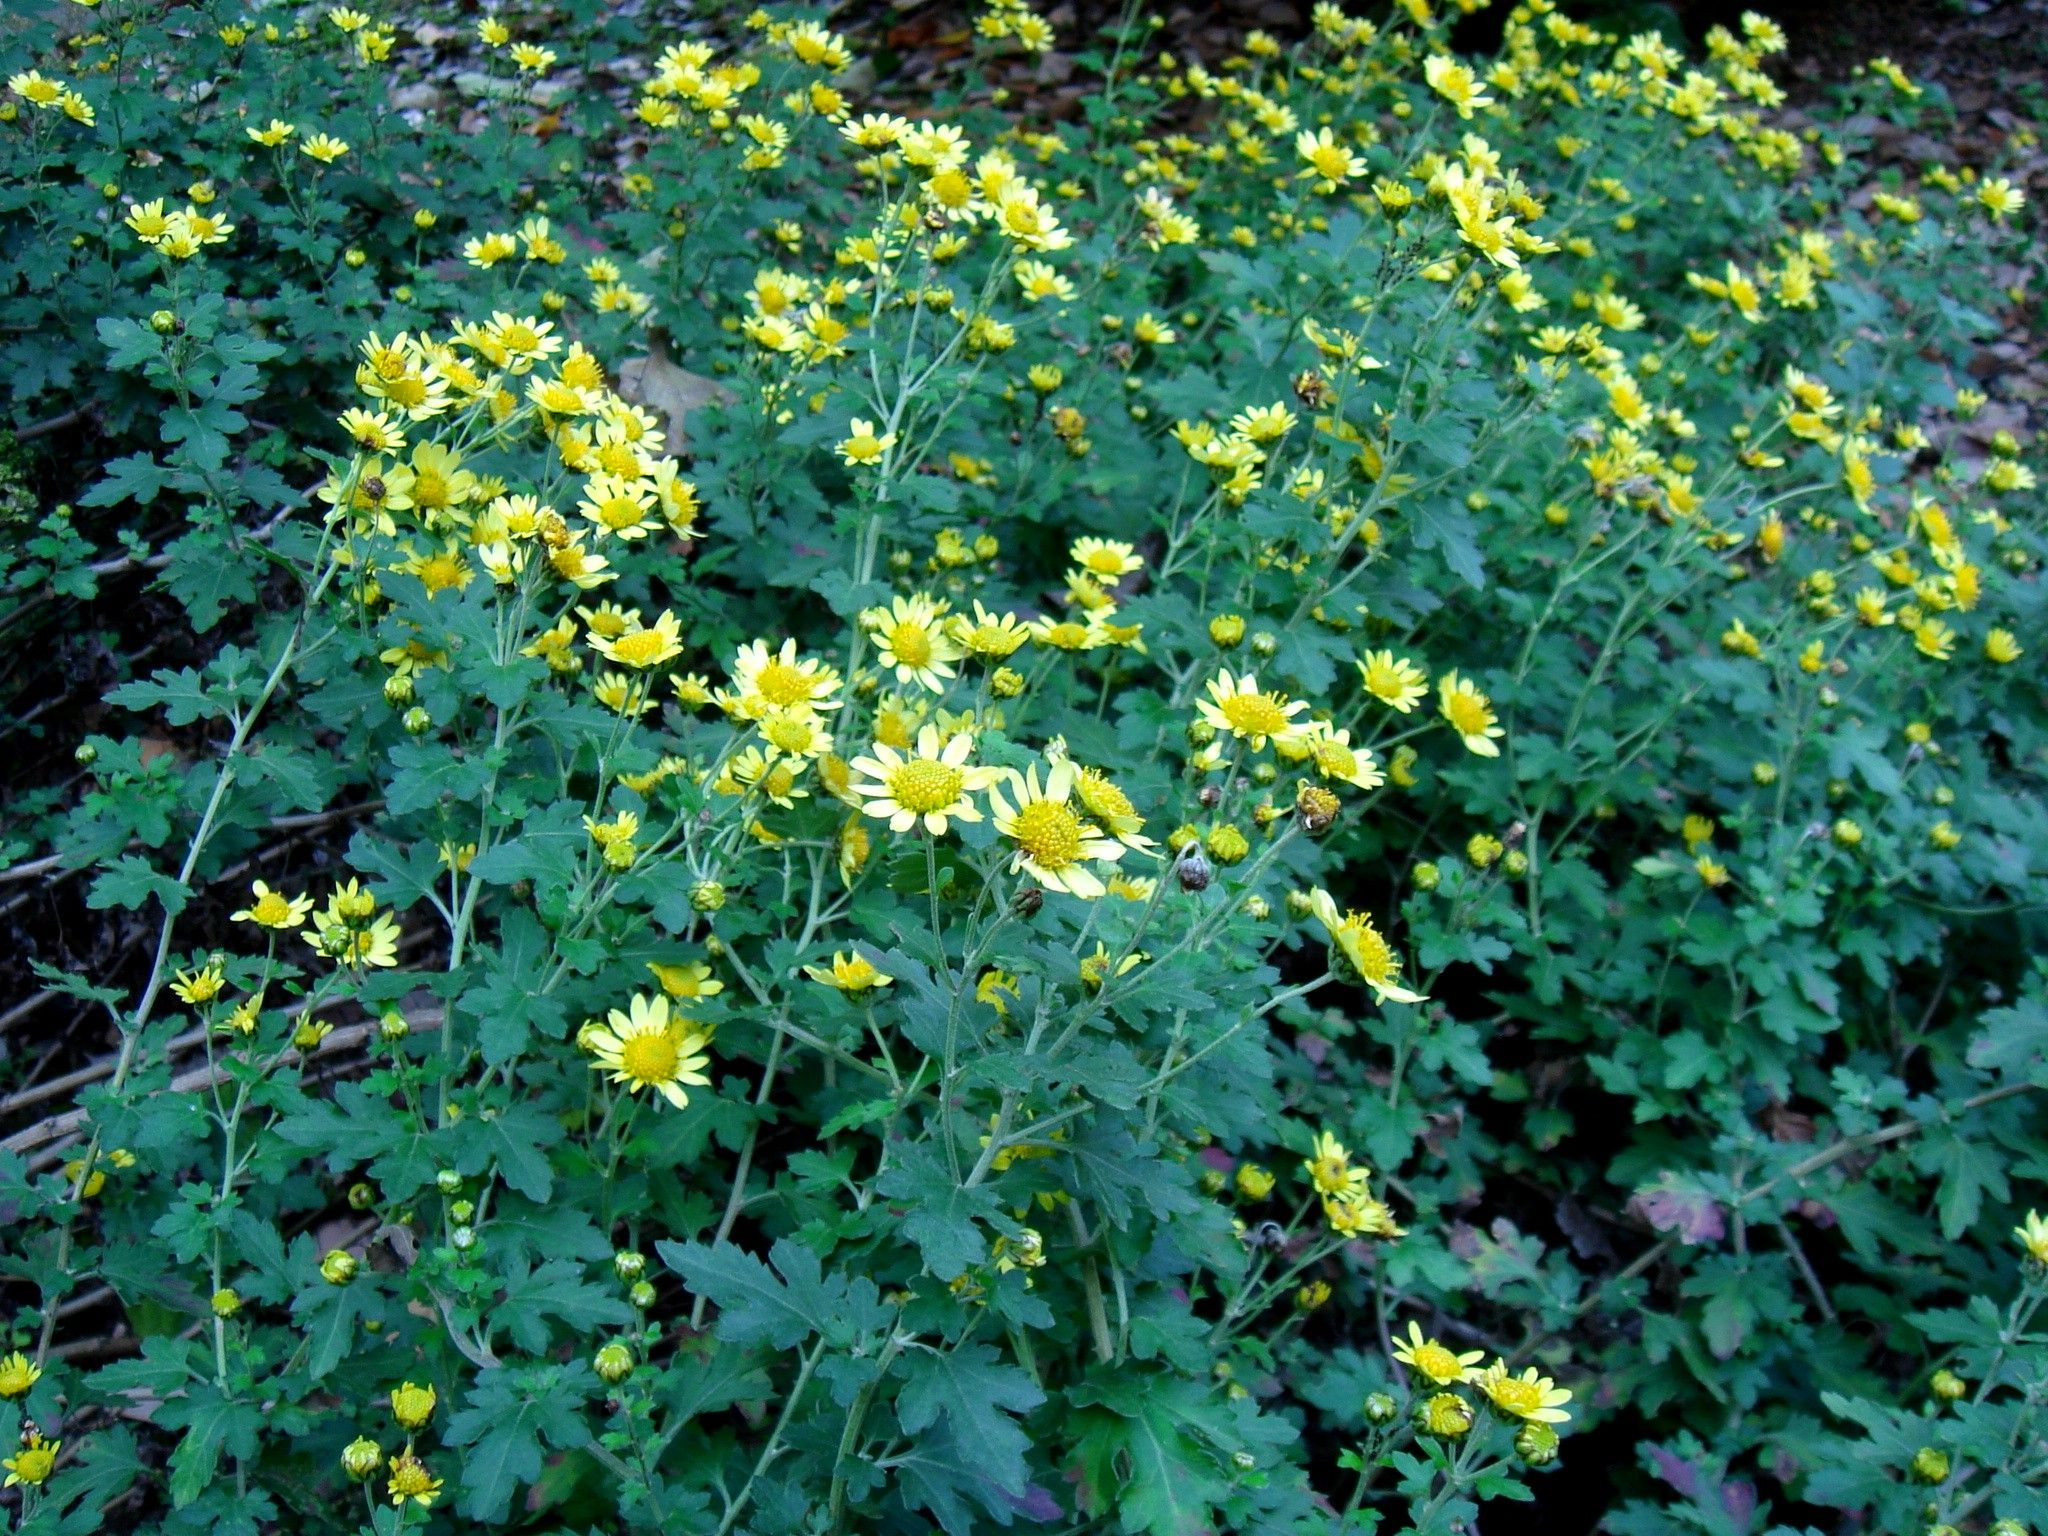 Berühmt Chrysanthemum | Chrysanthemum indicum L. | Mom's Garden @RD_55